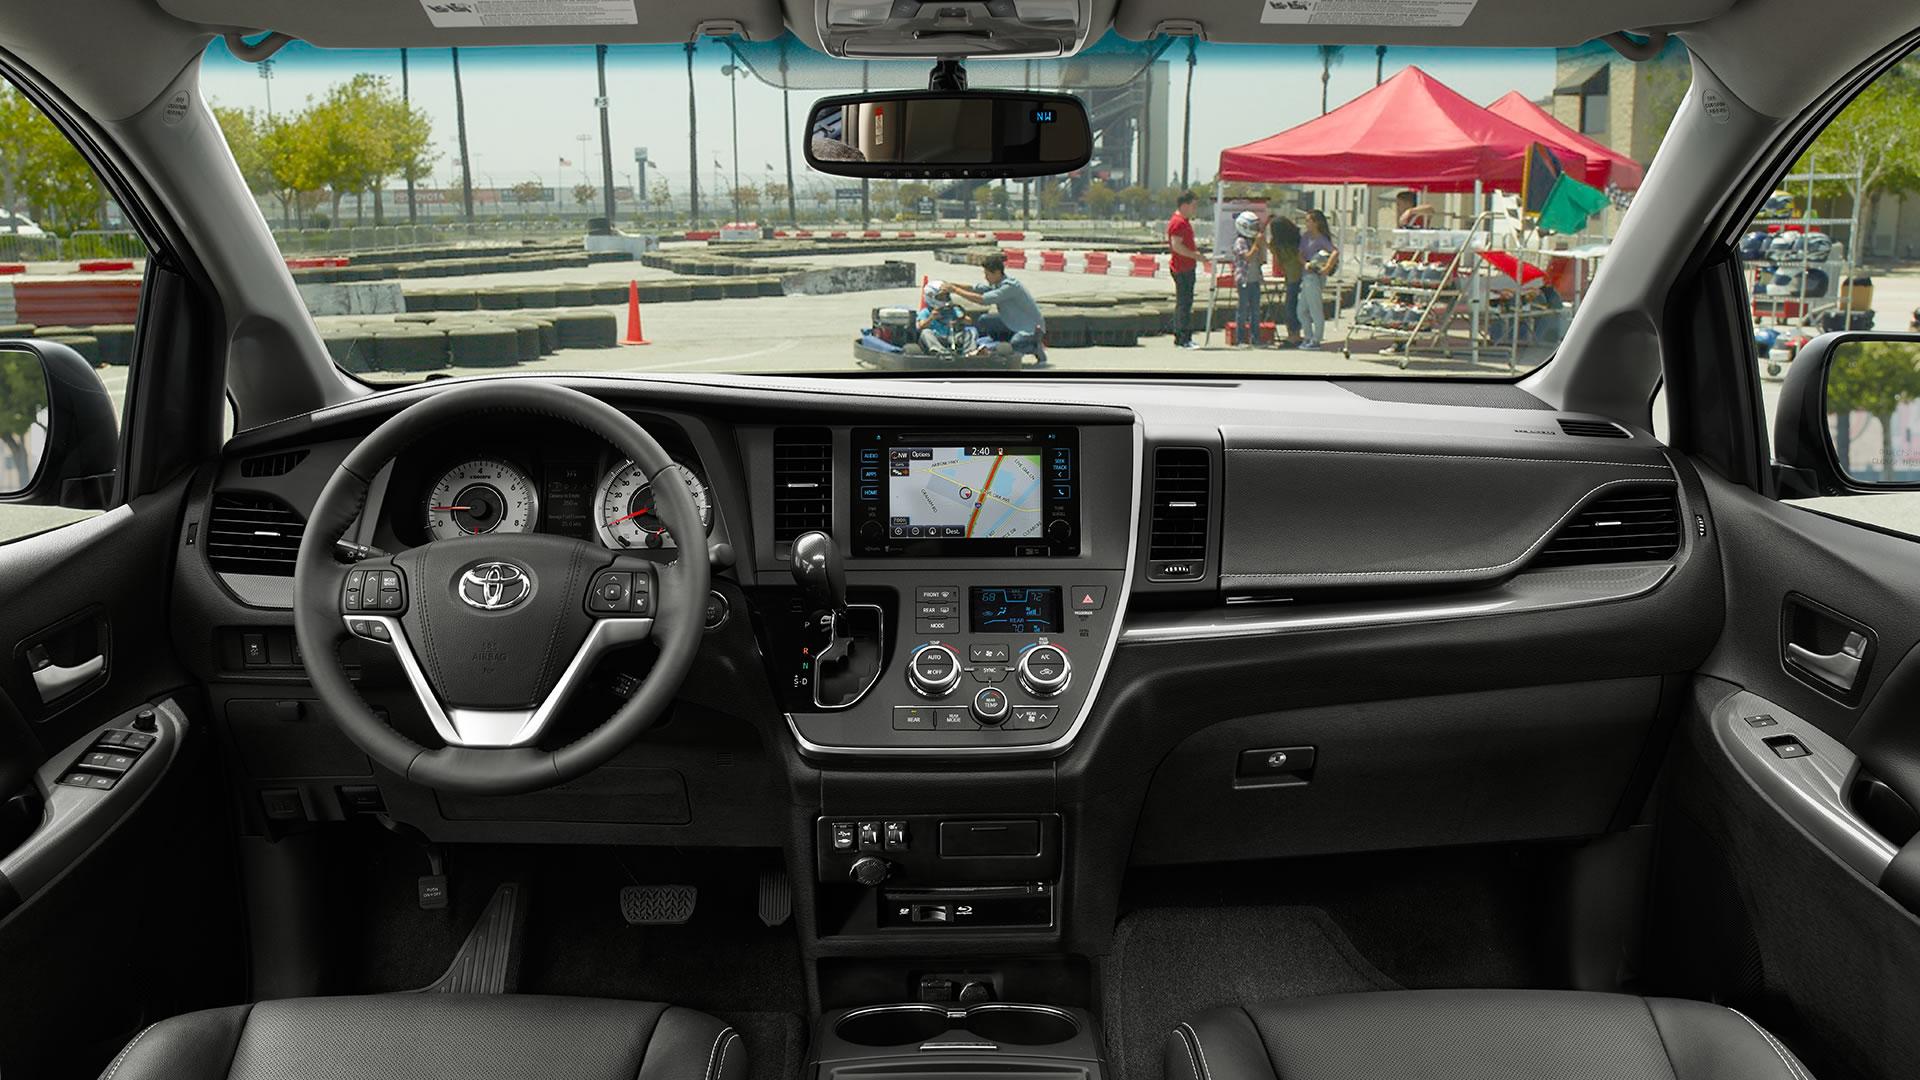 Toyota Sienna Interior Lightbox